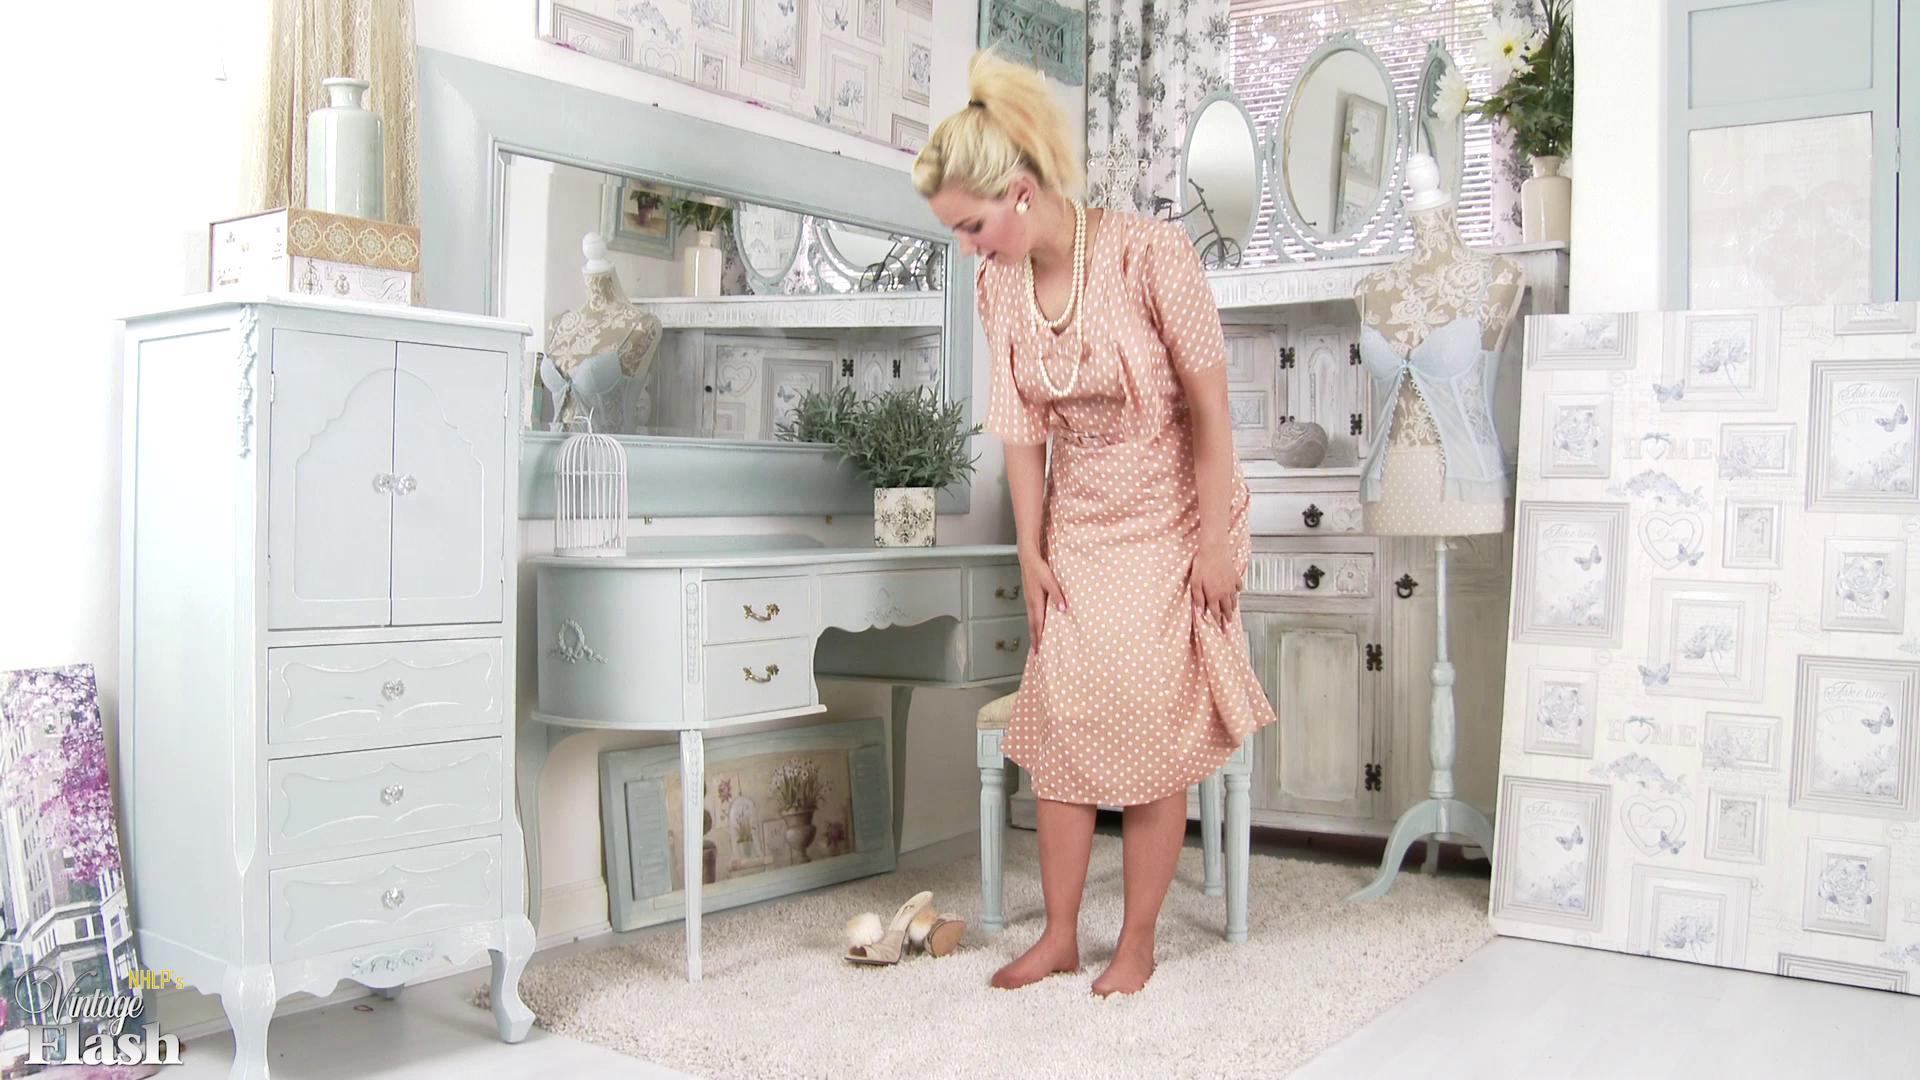 VintageFlash – Bad Dolly Gentlemens Pleasure